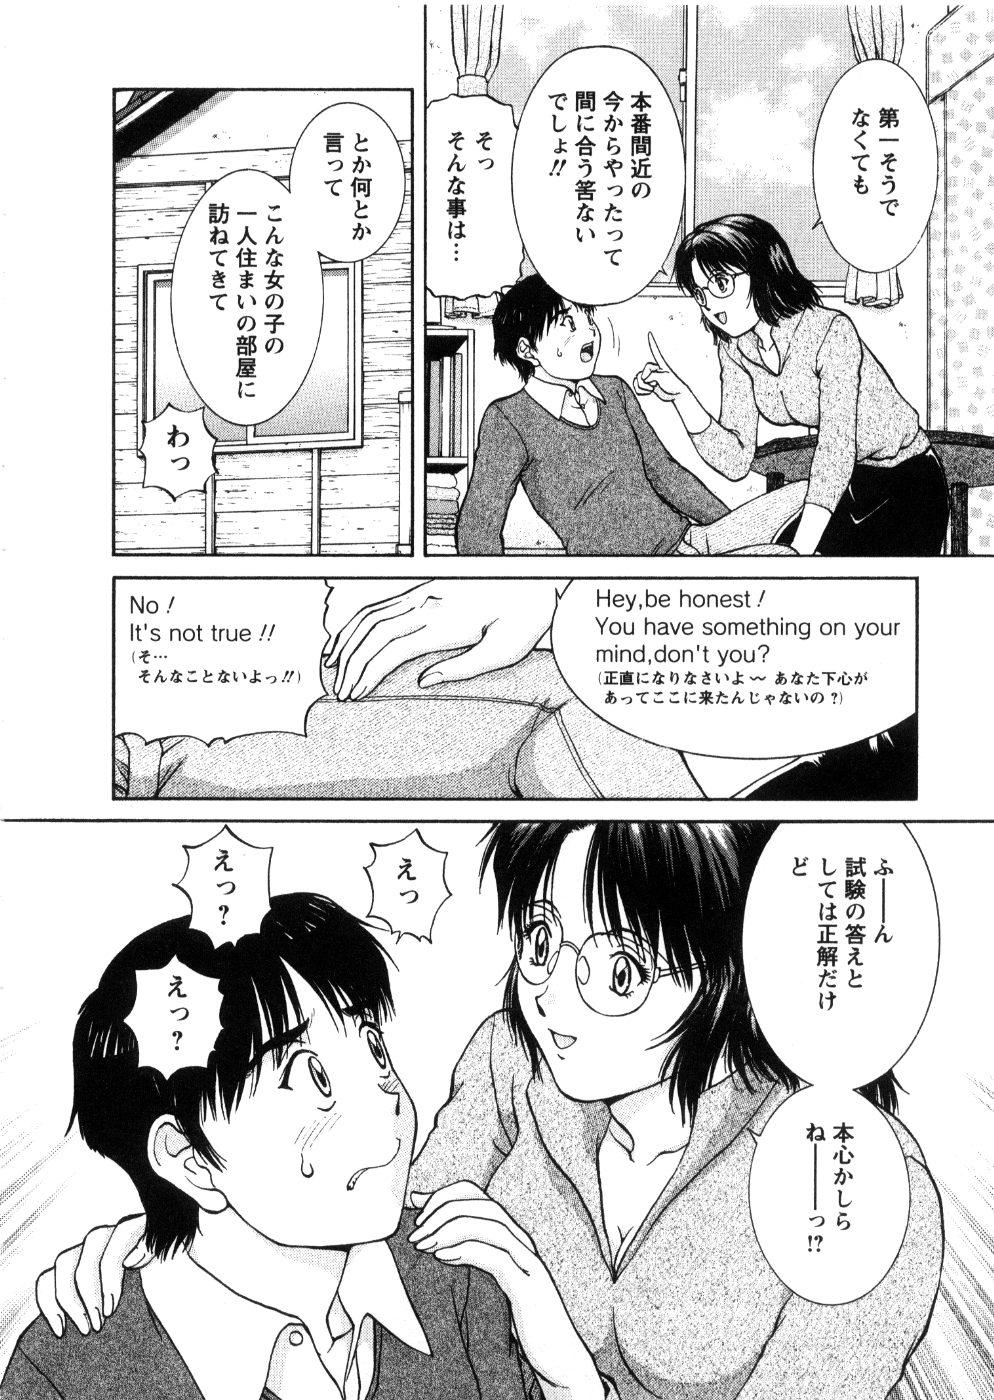 Oneechan-tachi ga Yatte Kuru 03 117